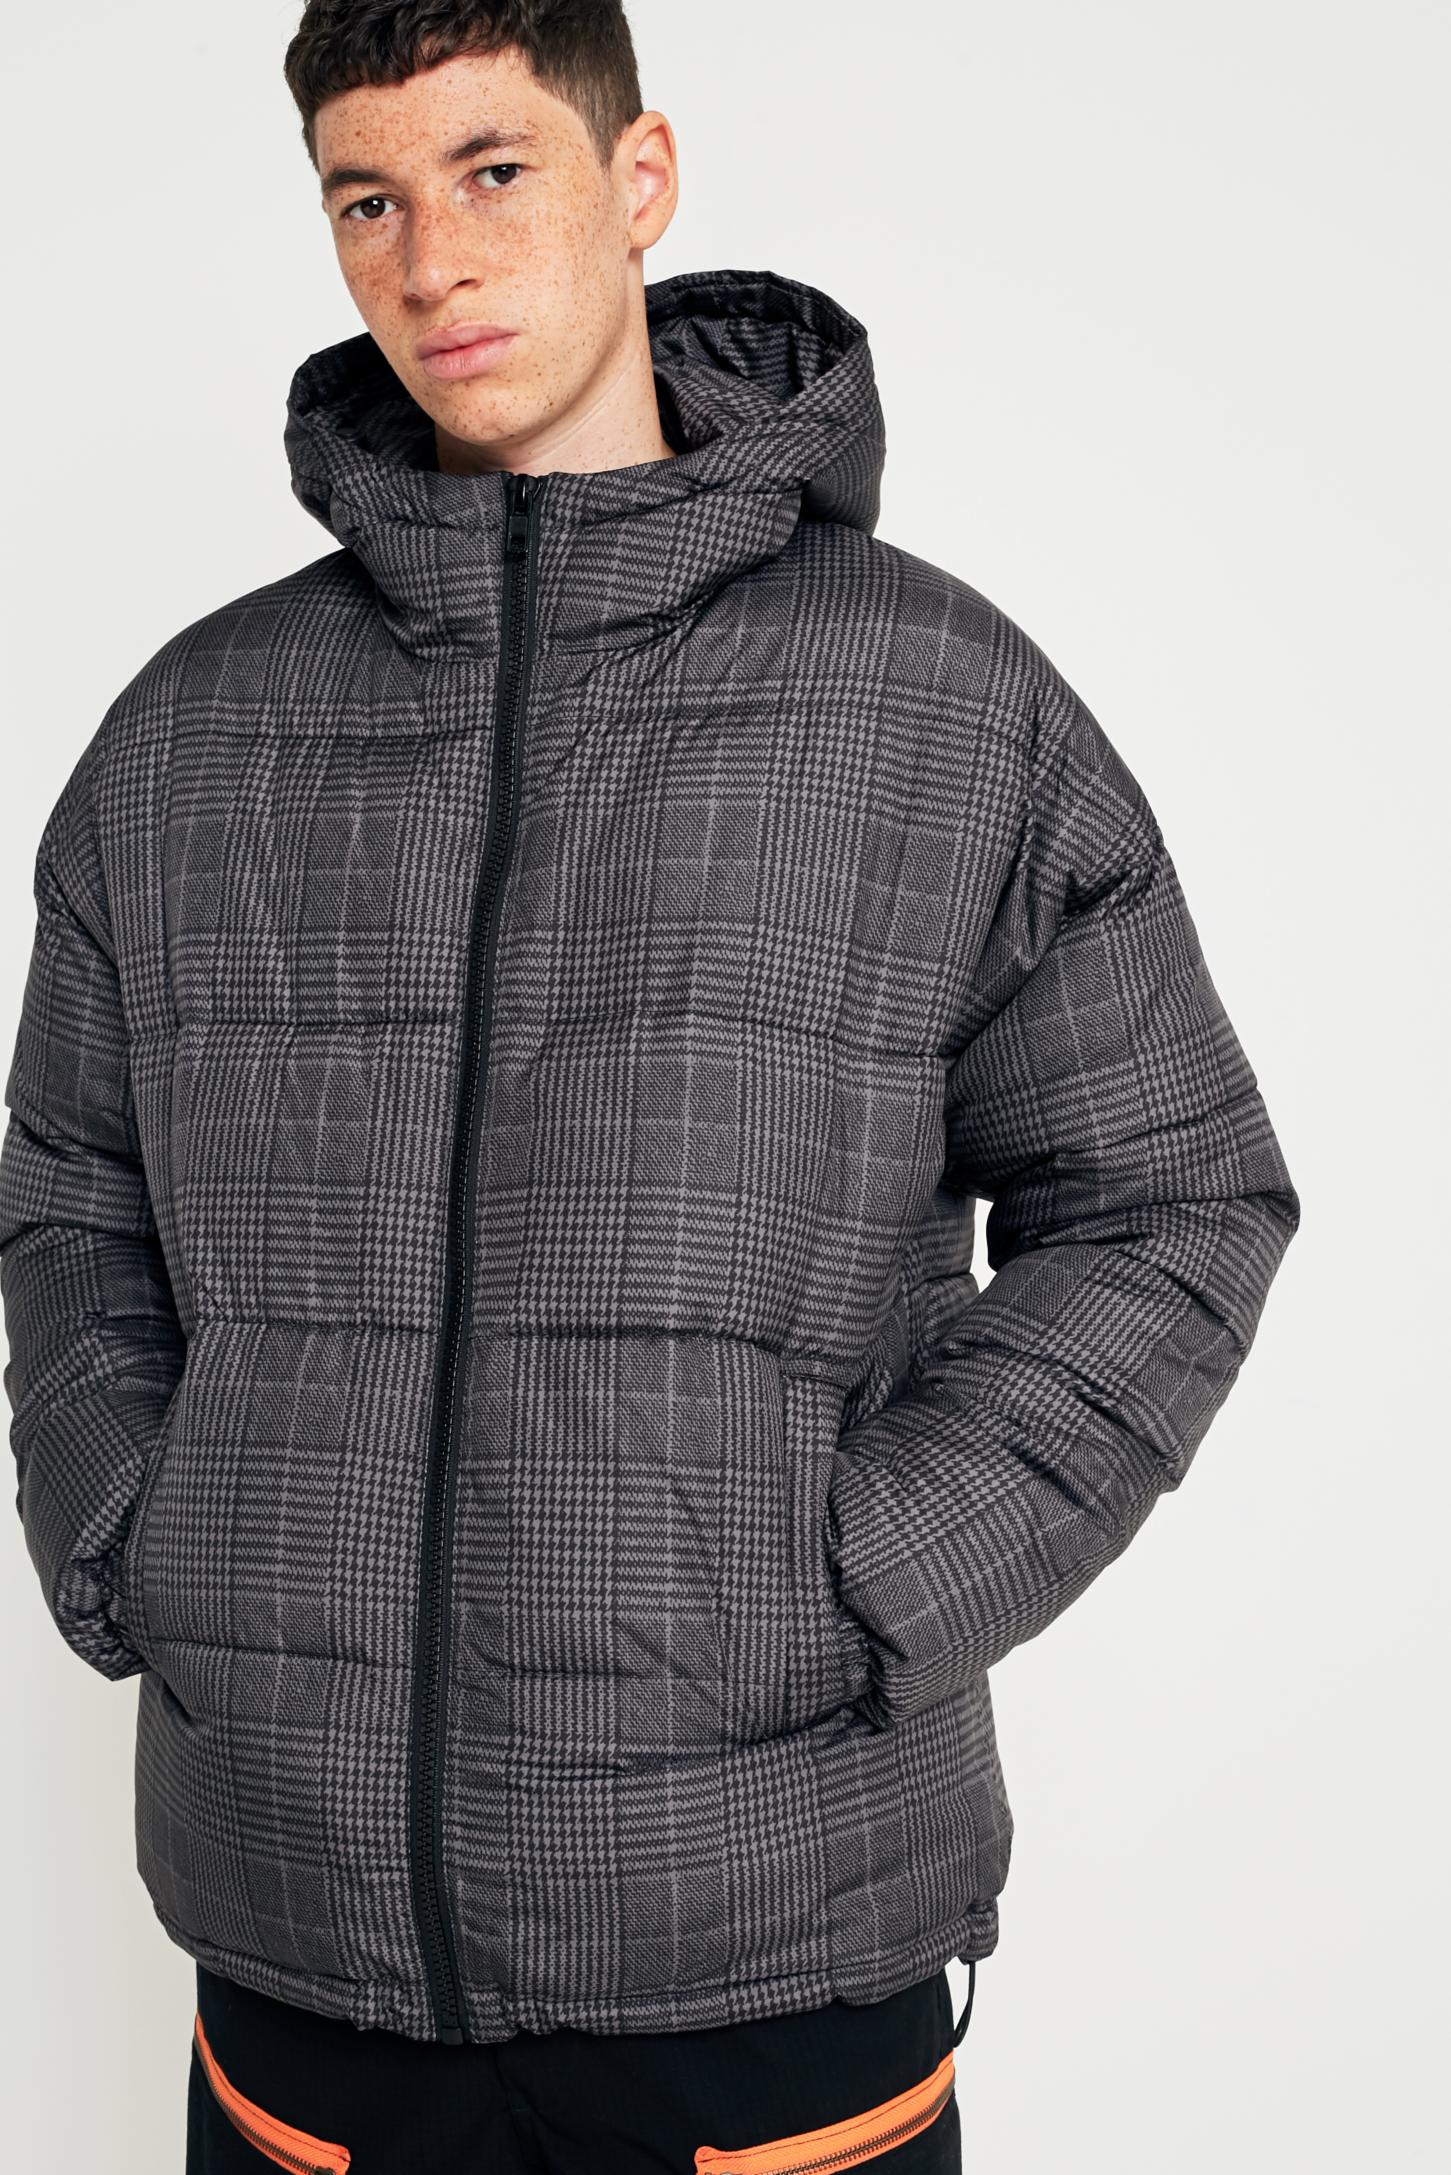 Men's Jackets & Coats   Parkas, Denim & Bomber Jackets   Urban ...